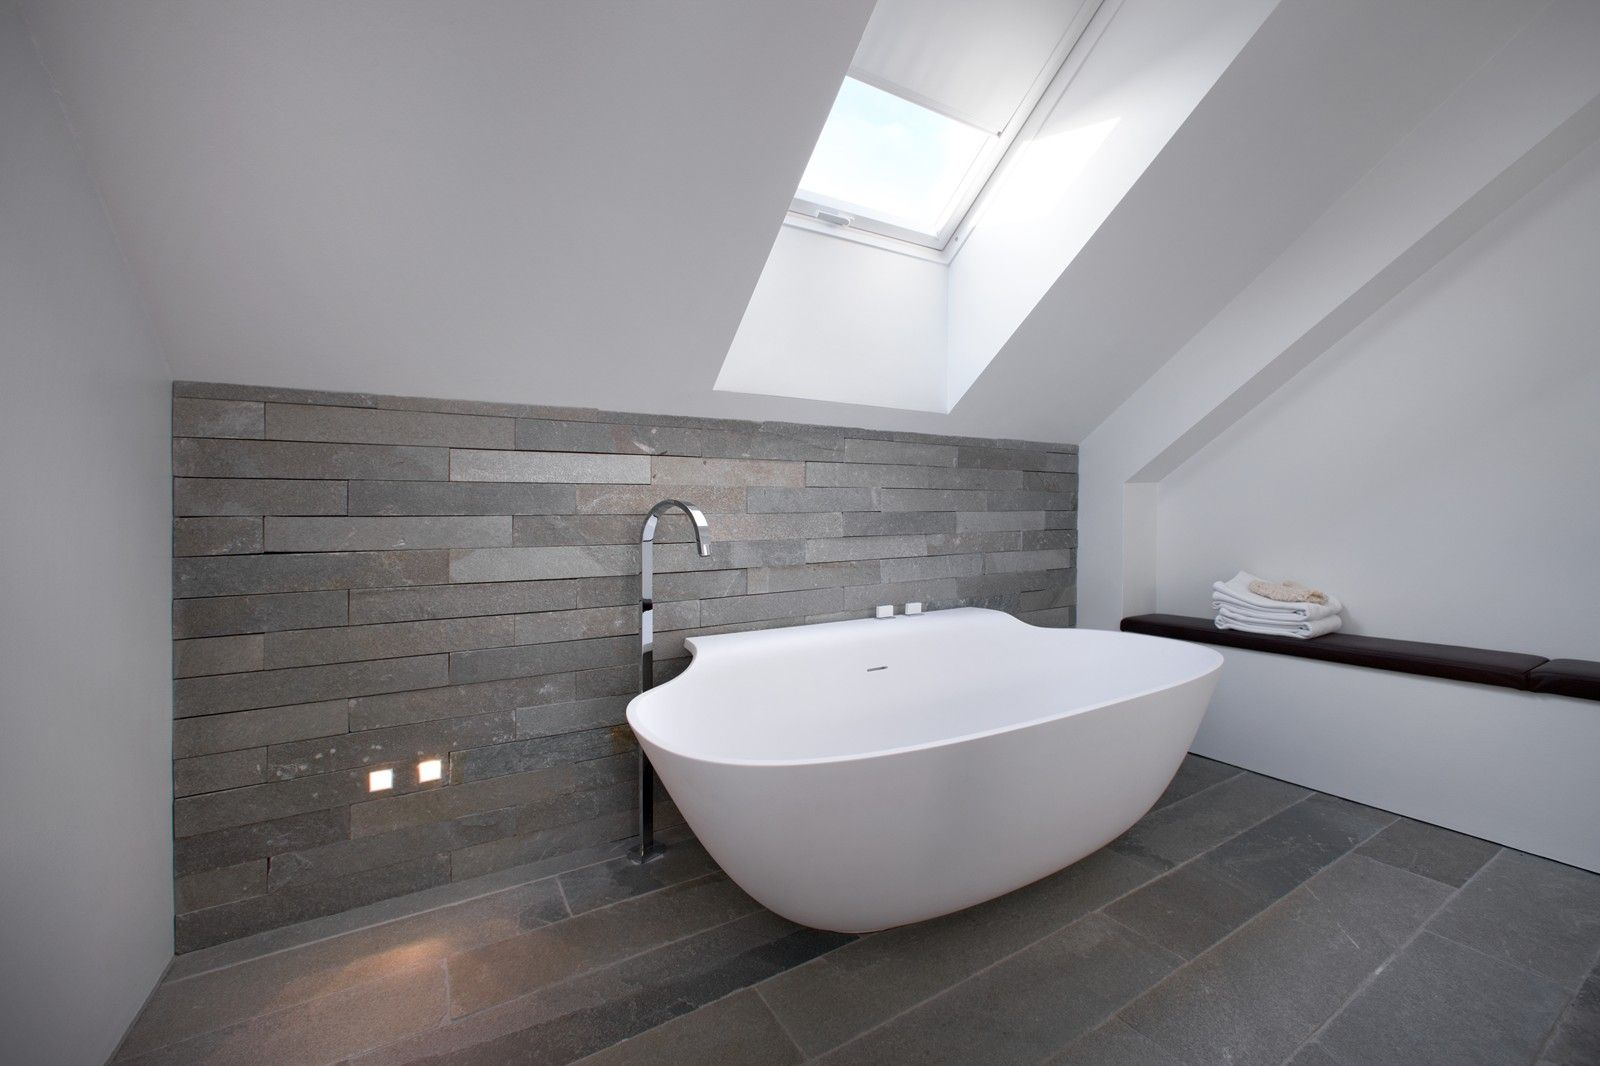 Villa s bjarnhoff a s architecture # interior # light # modern